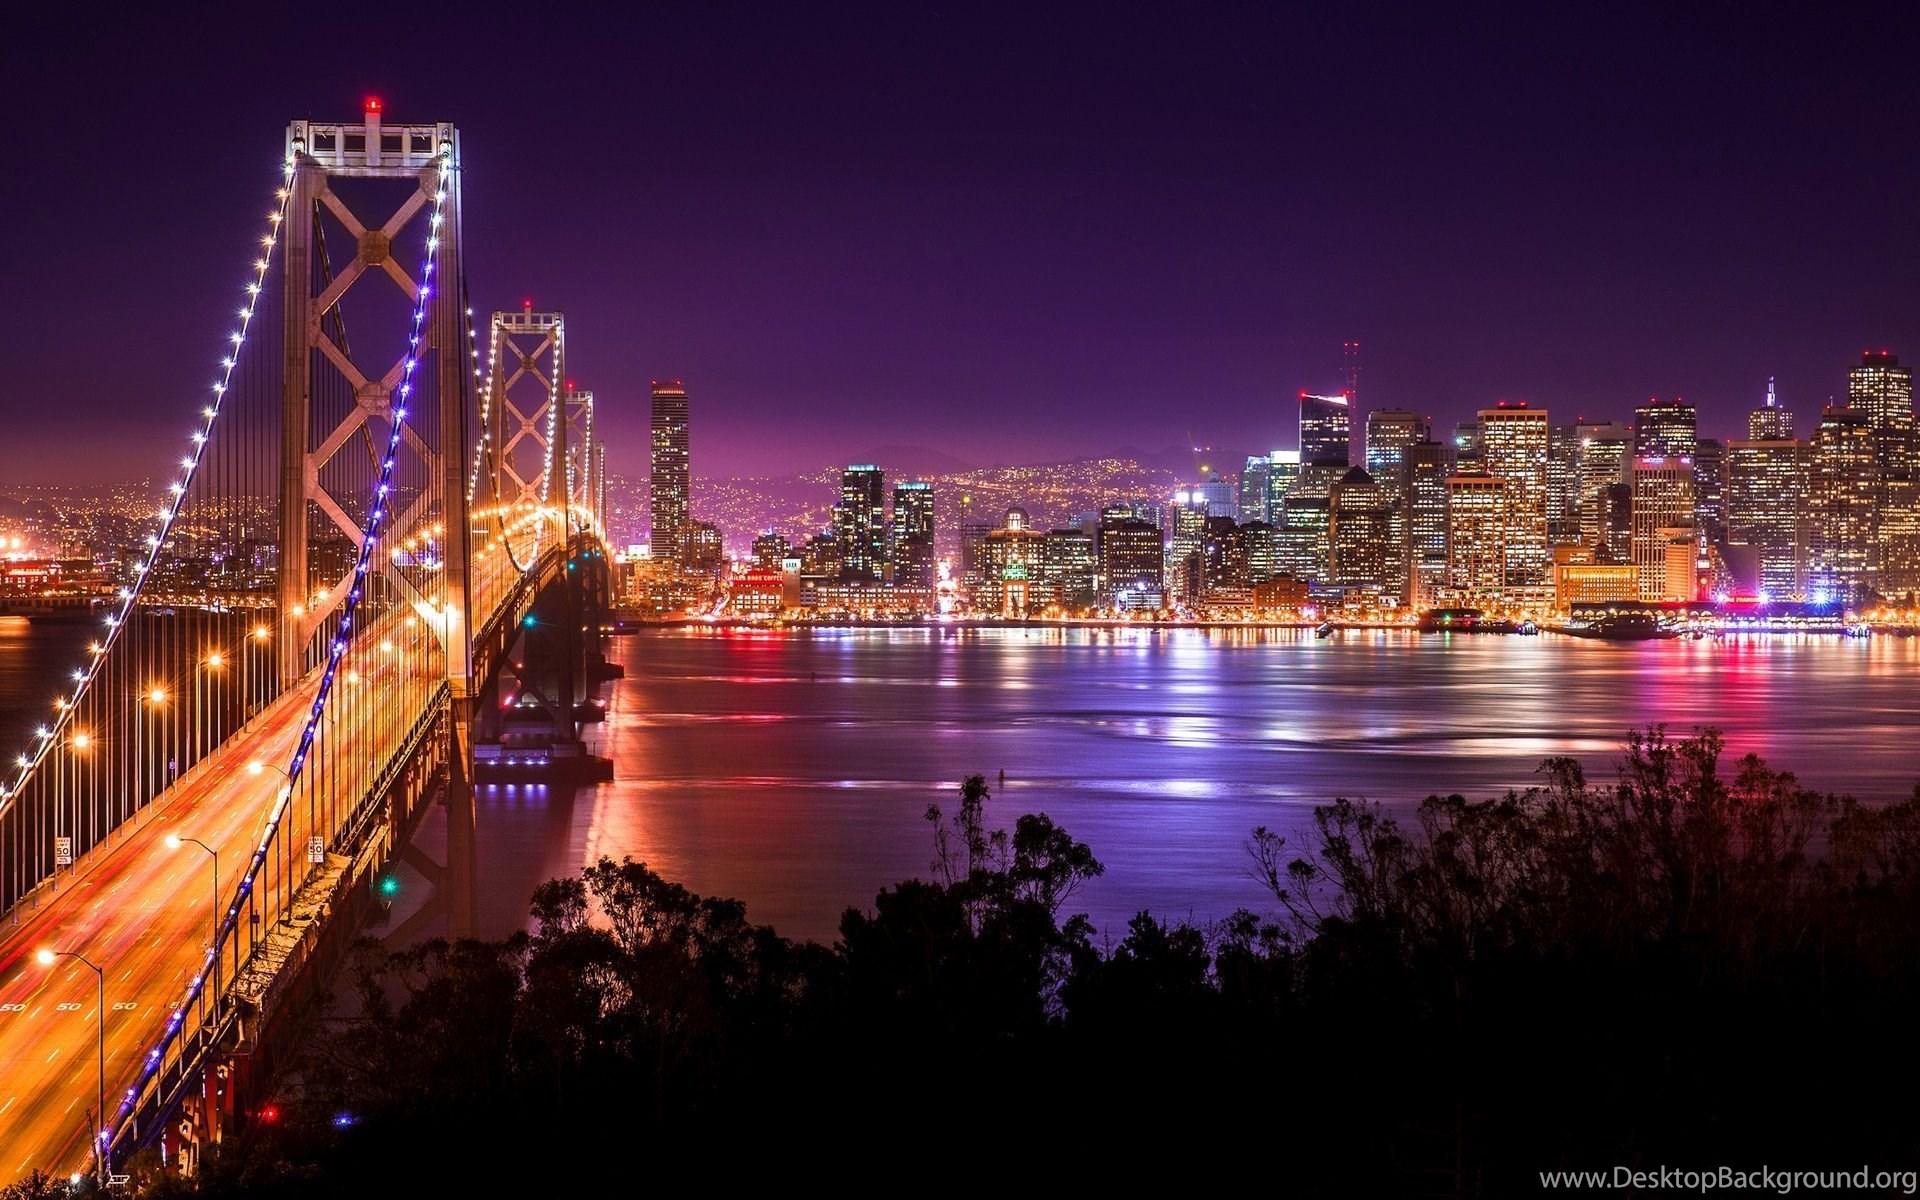 San francisco california wallpapers wide amazing desktop background widescreen widescreen voltagebd Image collections